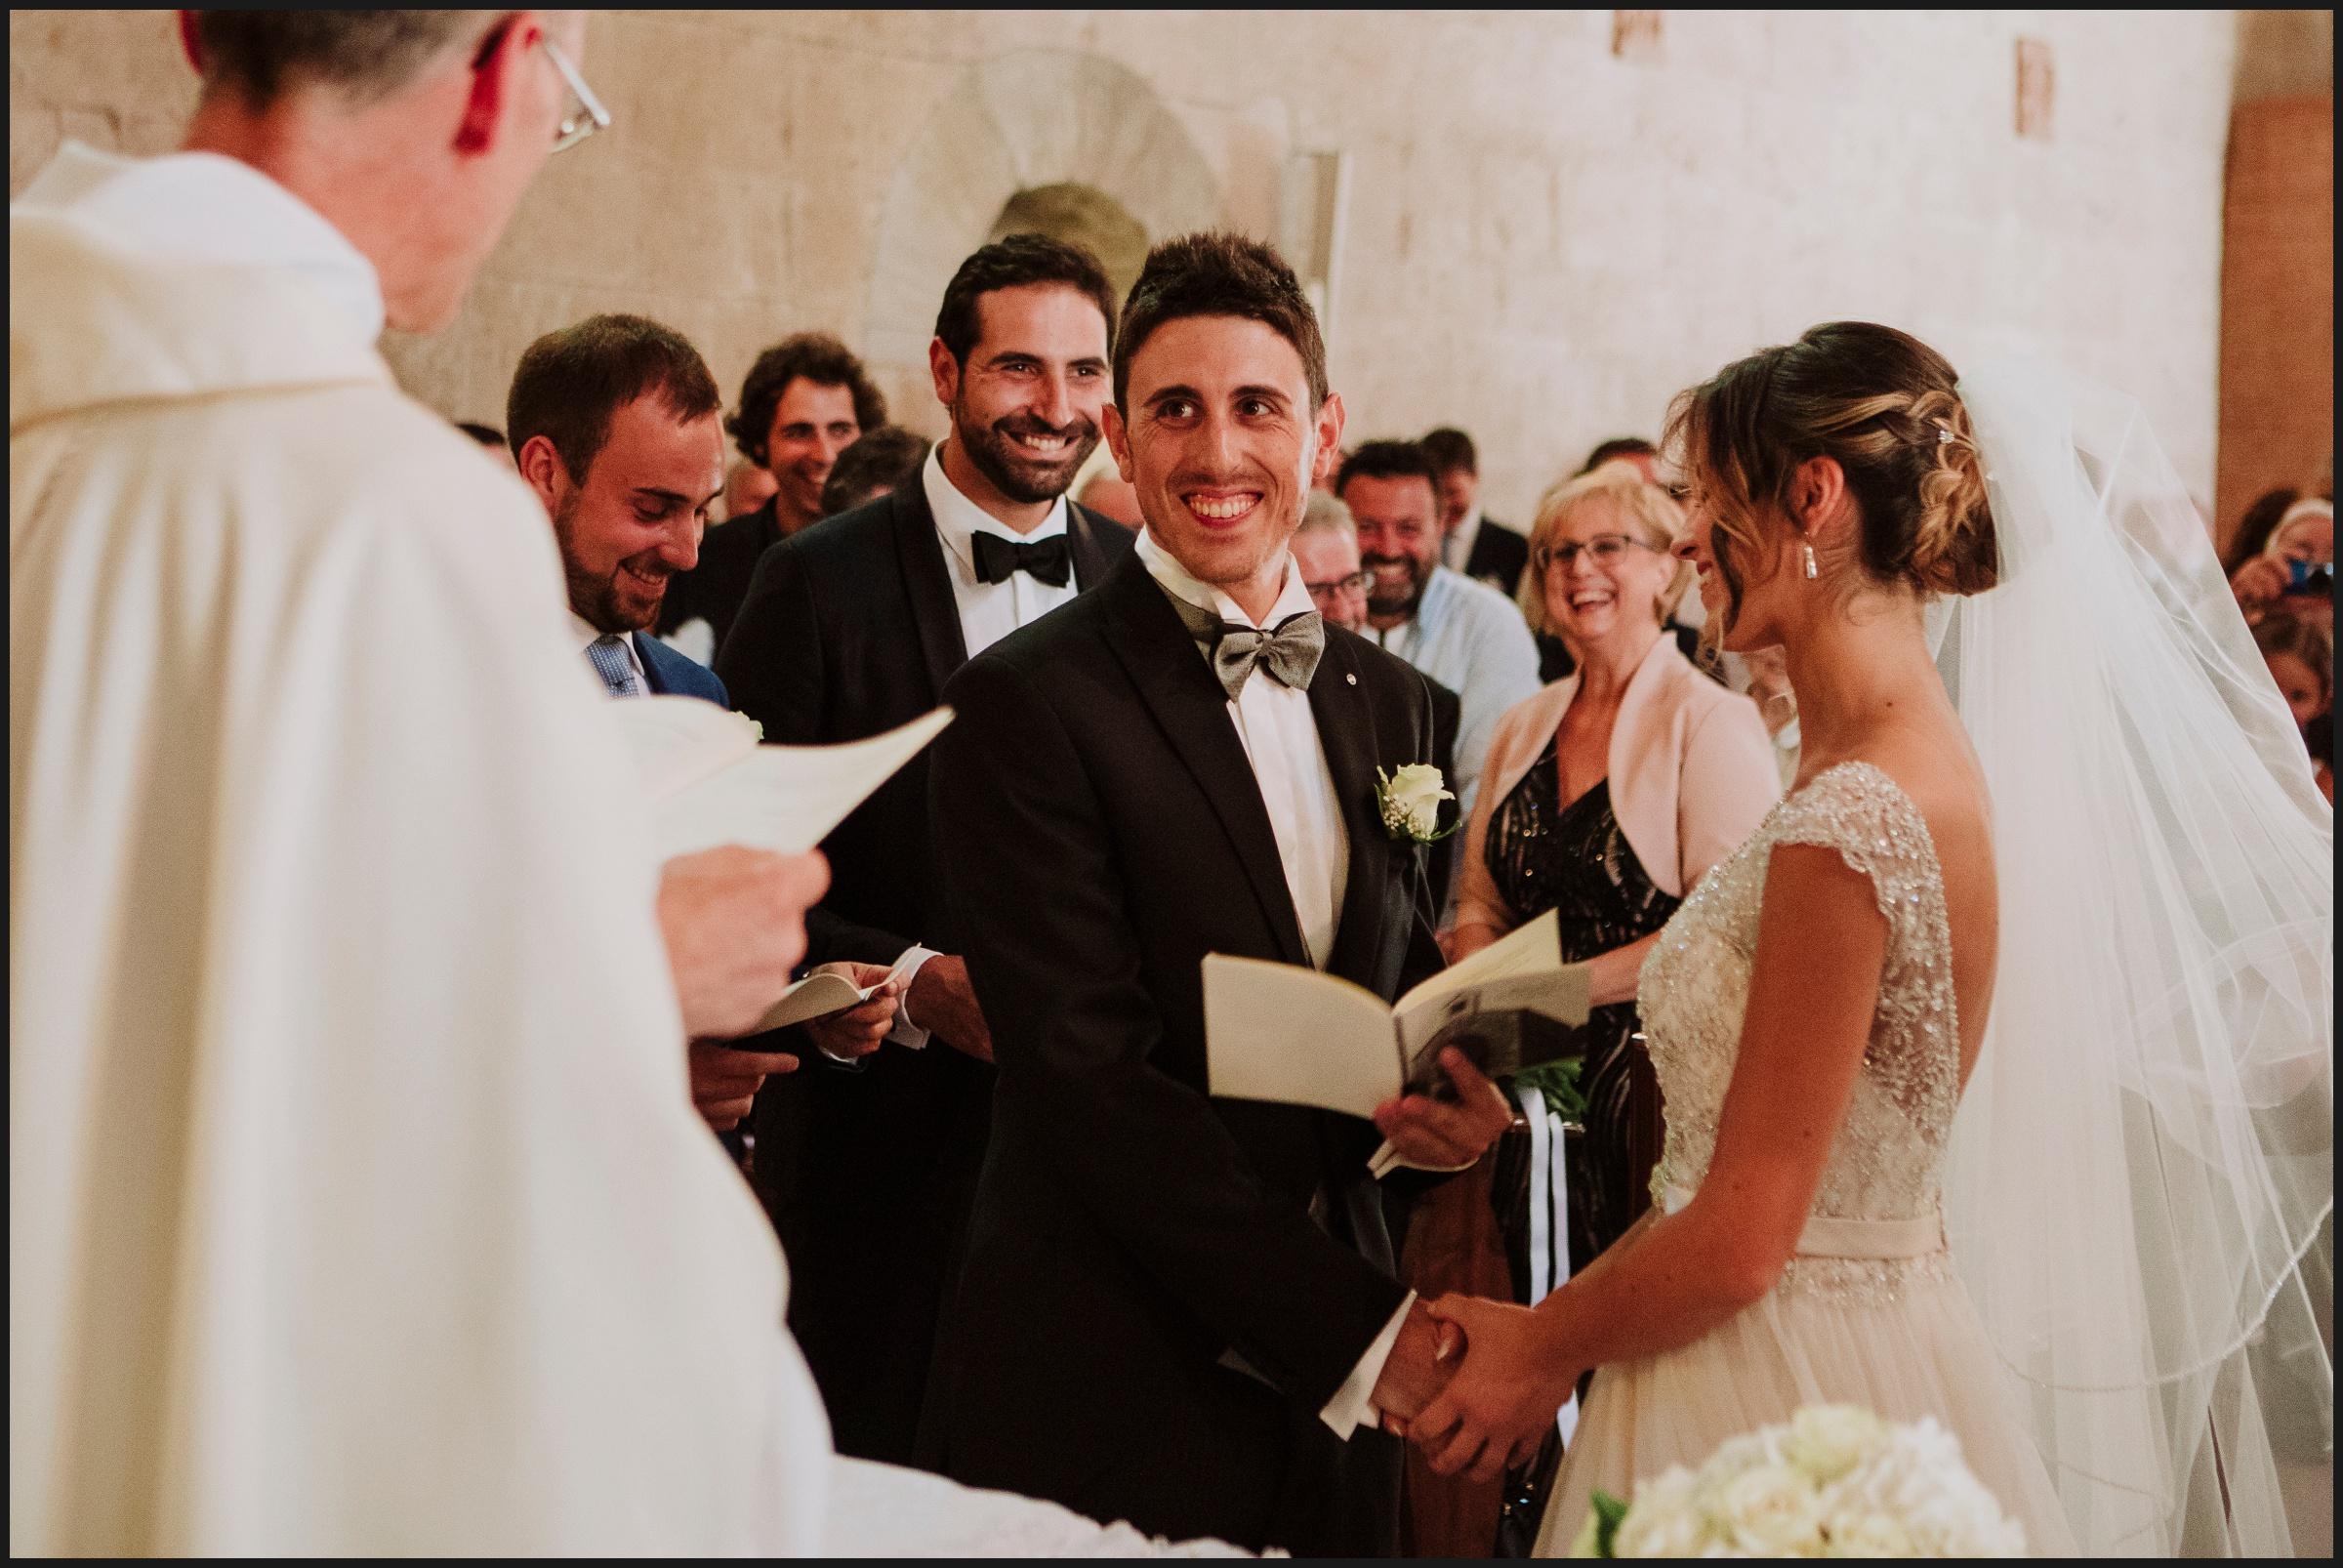 Wedding ceremony, groom smiling